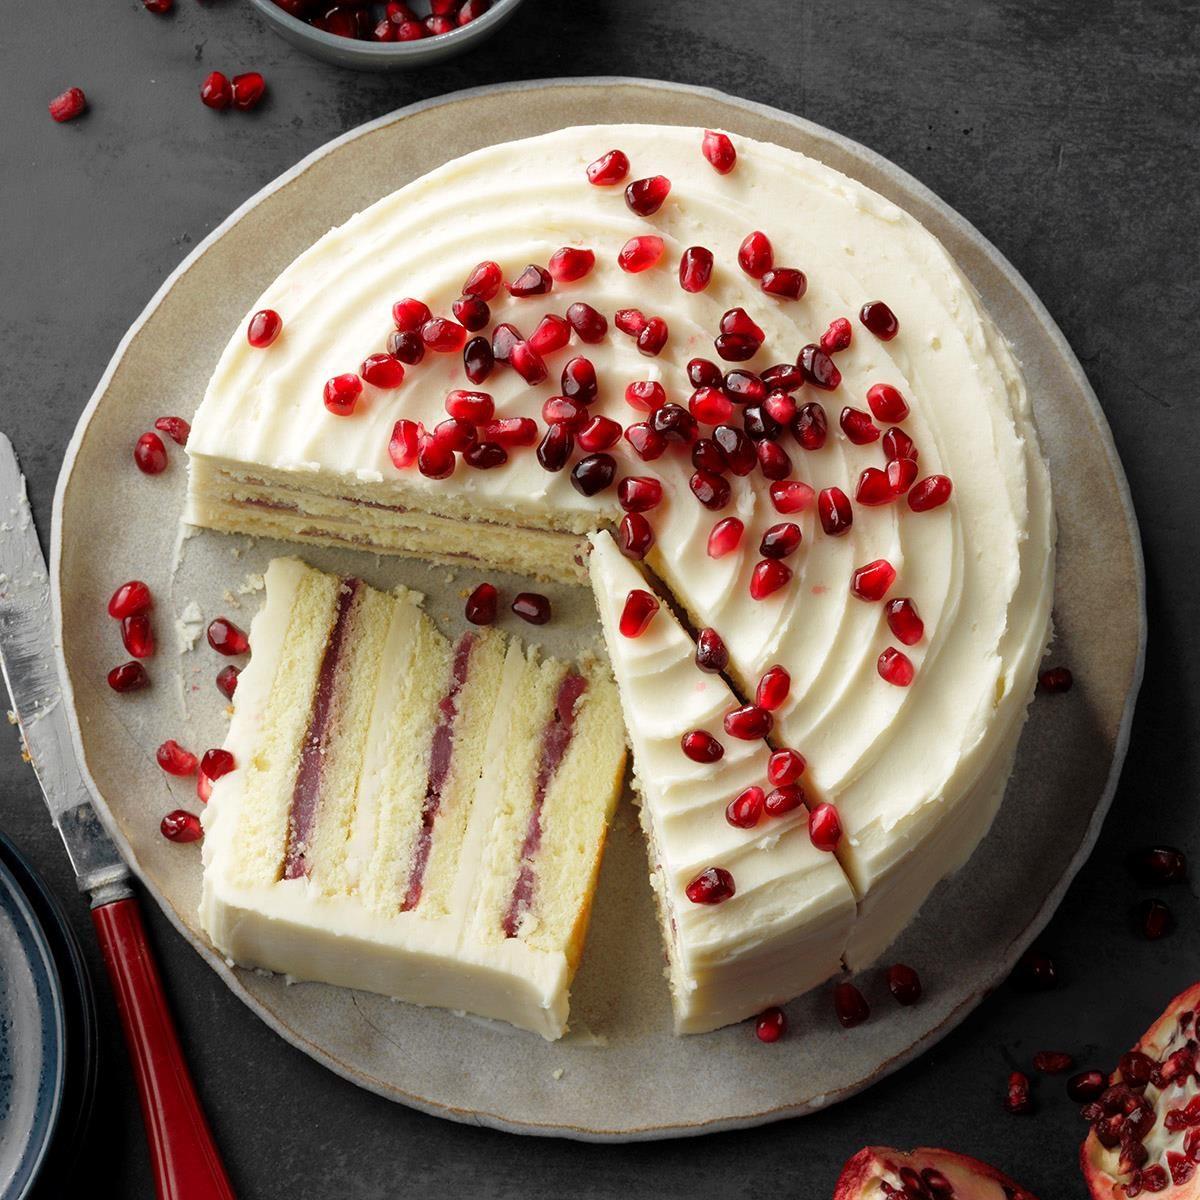 Oklahoma: Spiced Pomegranate-Pear Cake